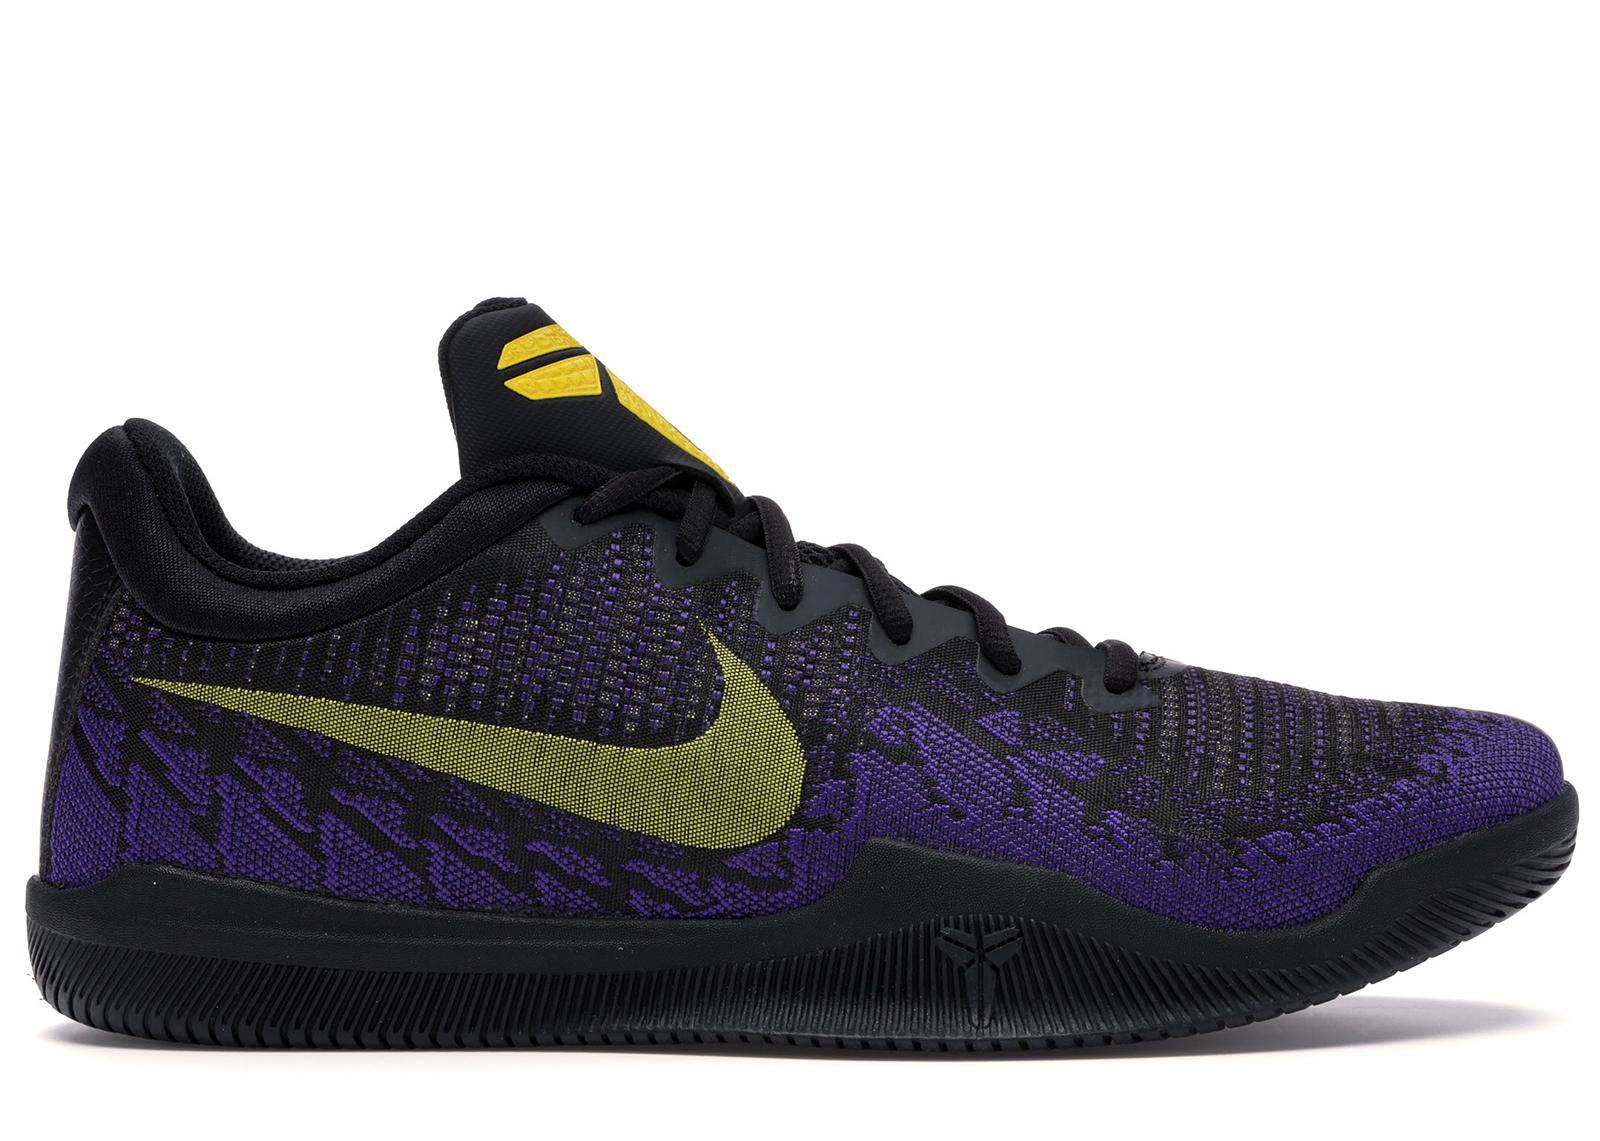 Nike Mamba Rage Lakers Away for Men - Lyst